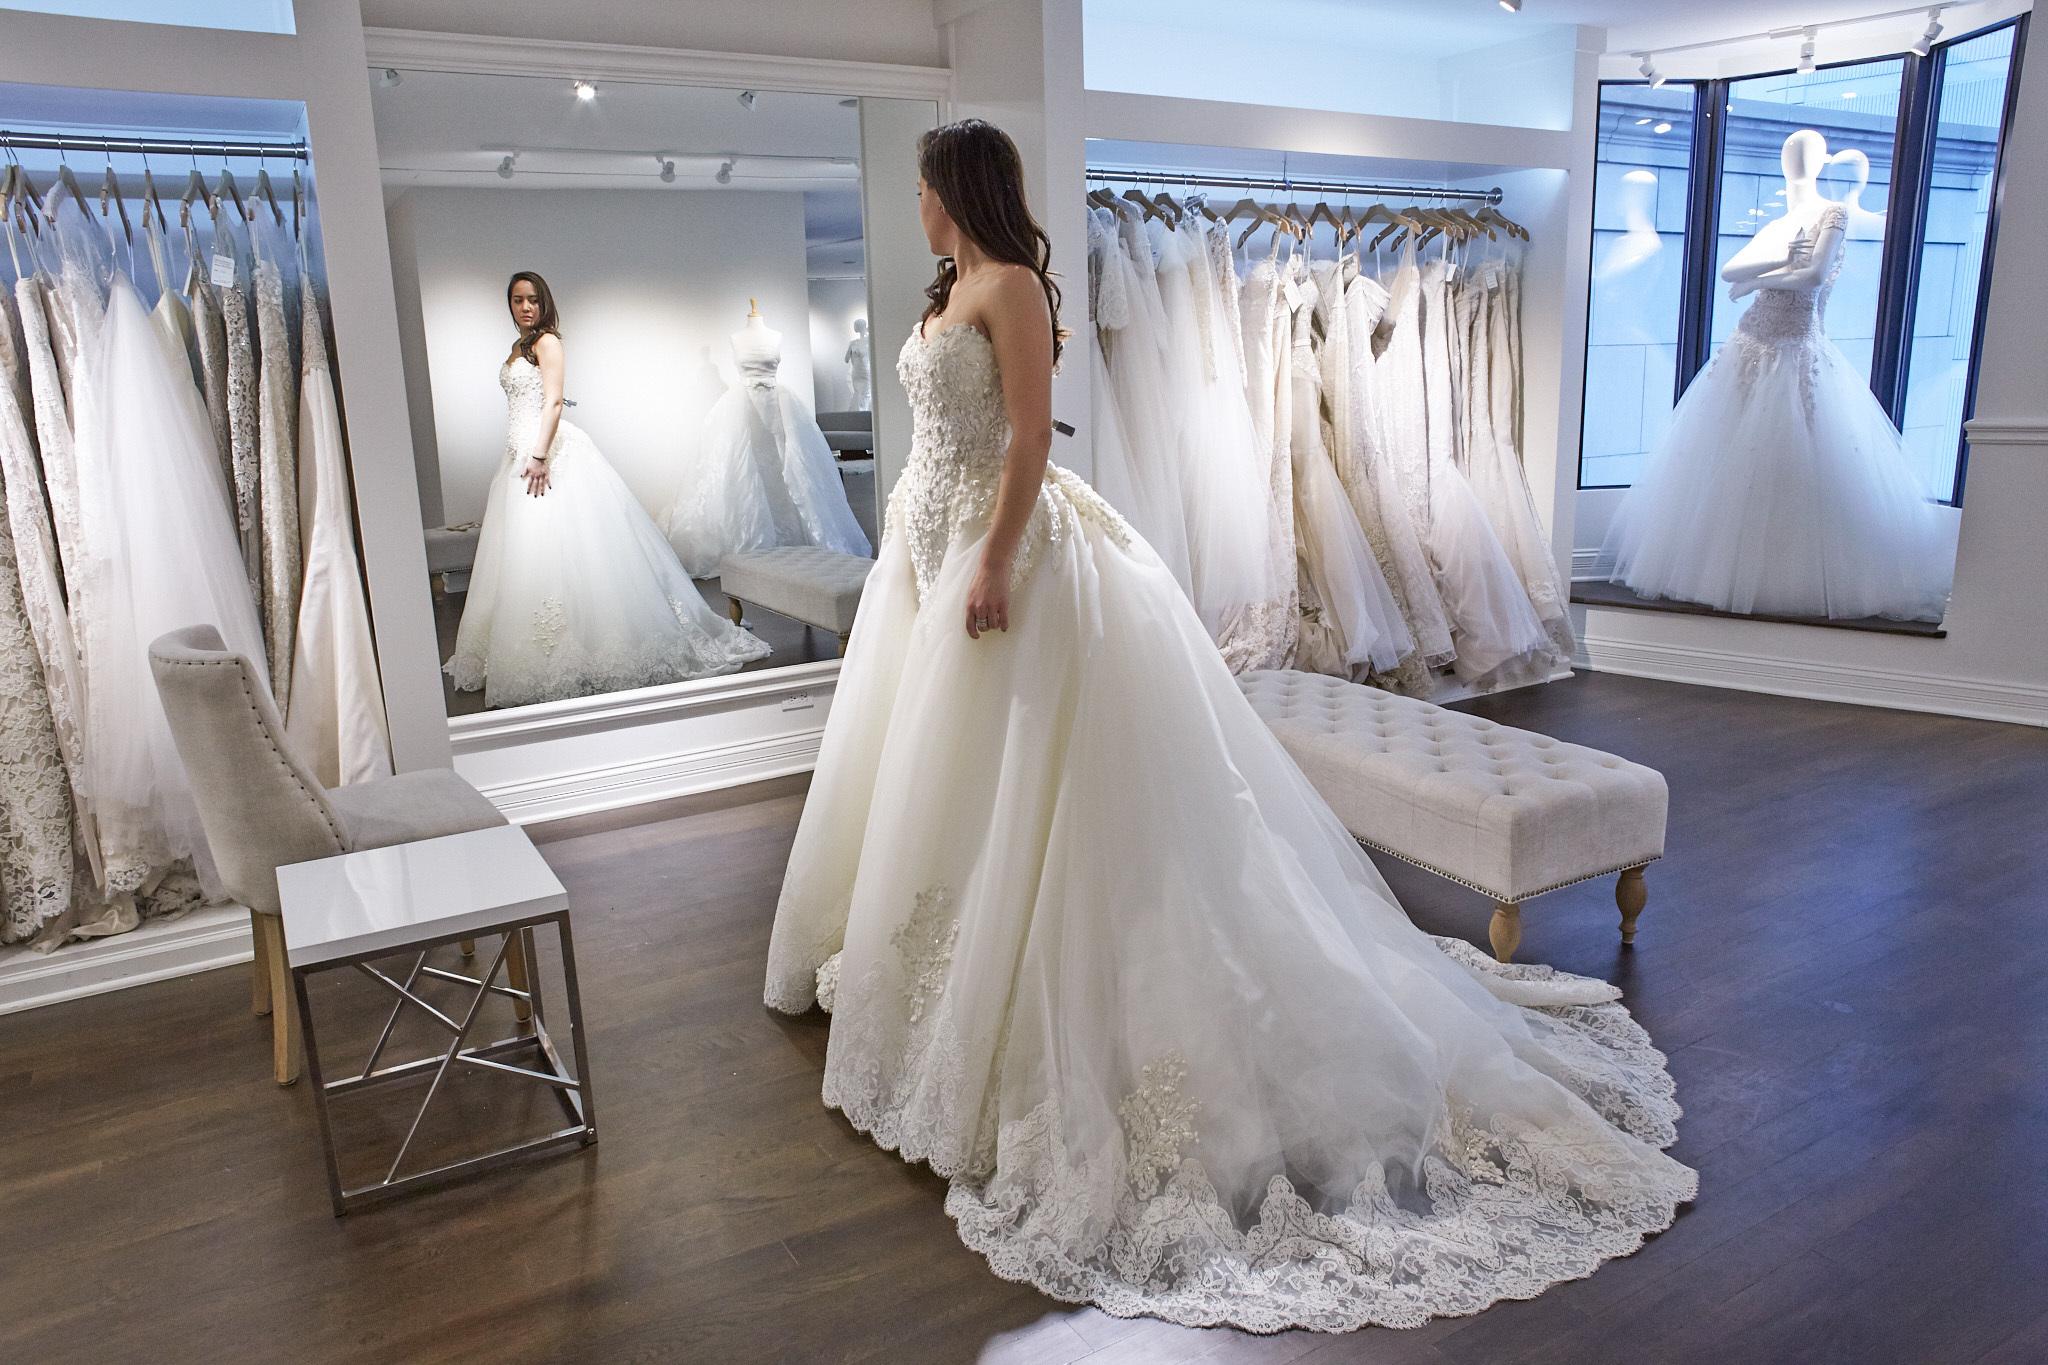 wedding dresses shops photo - 1